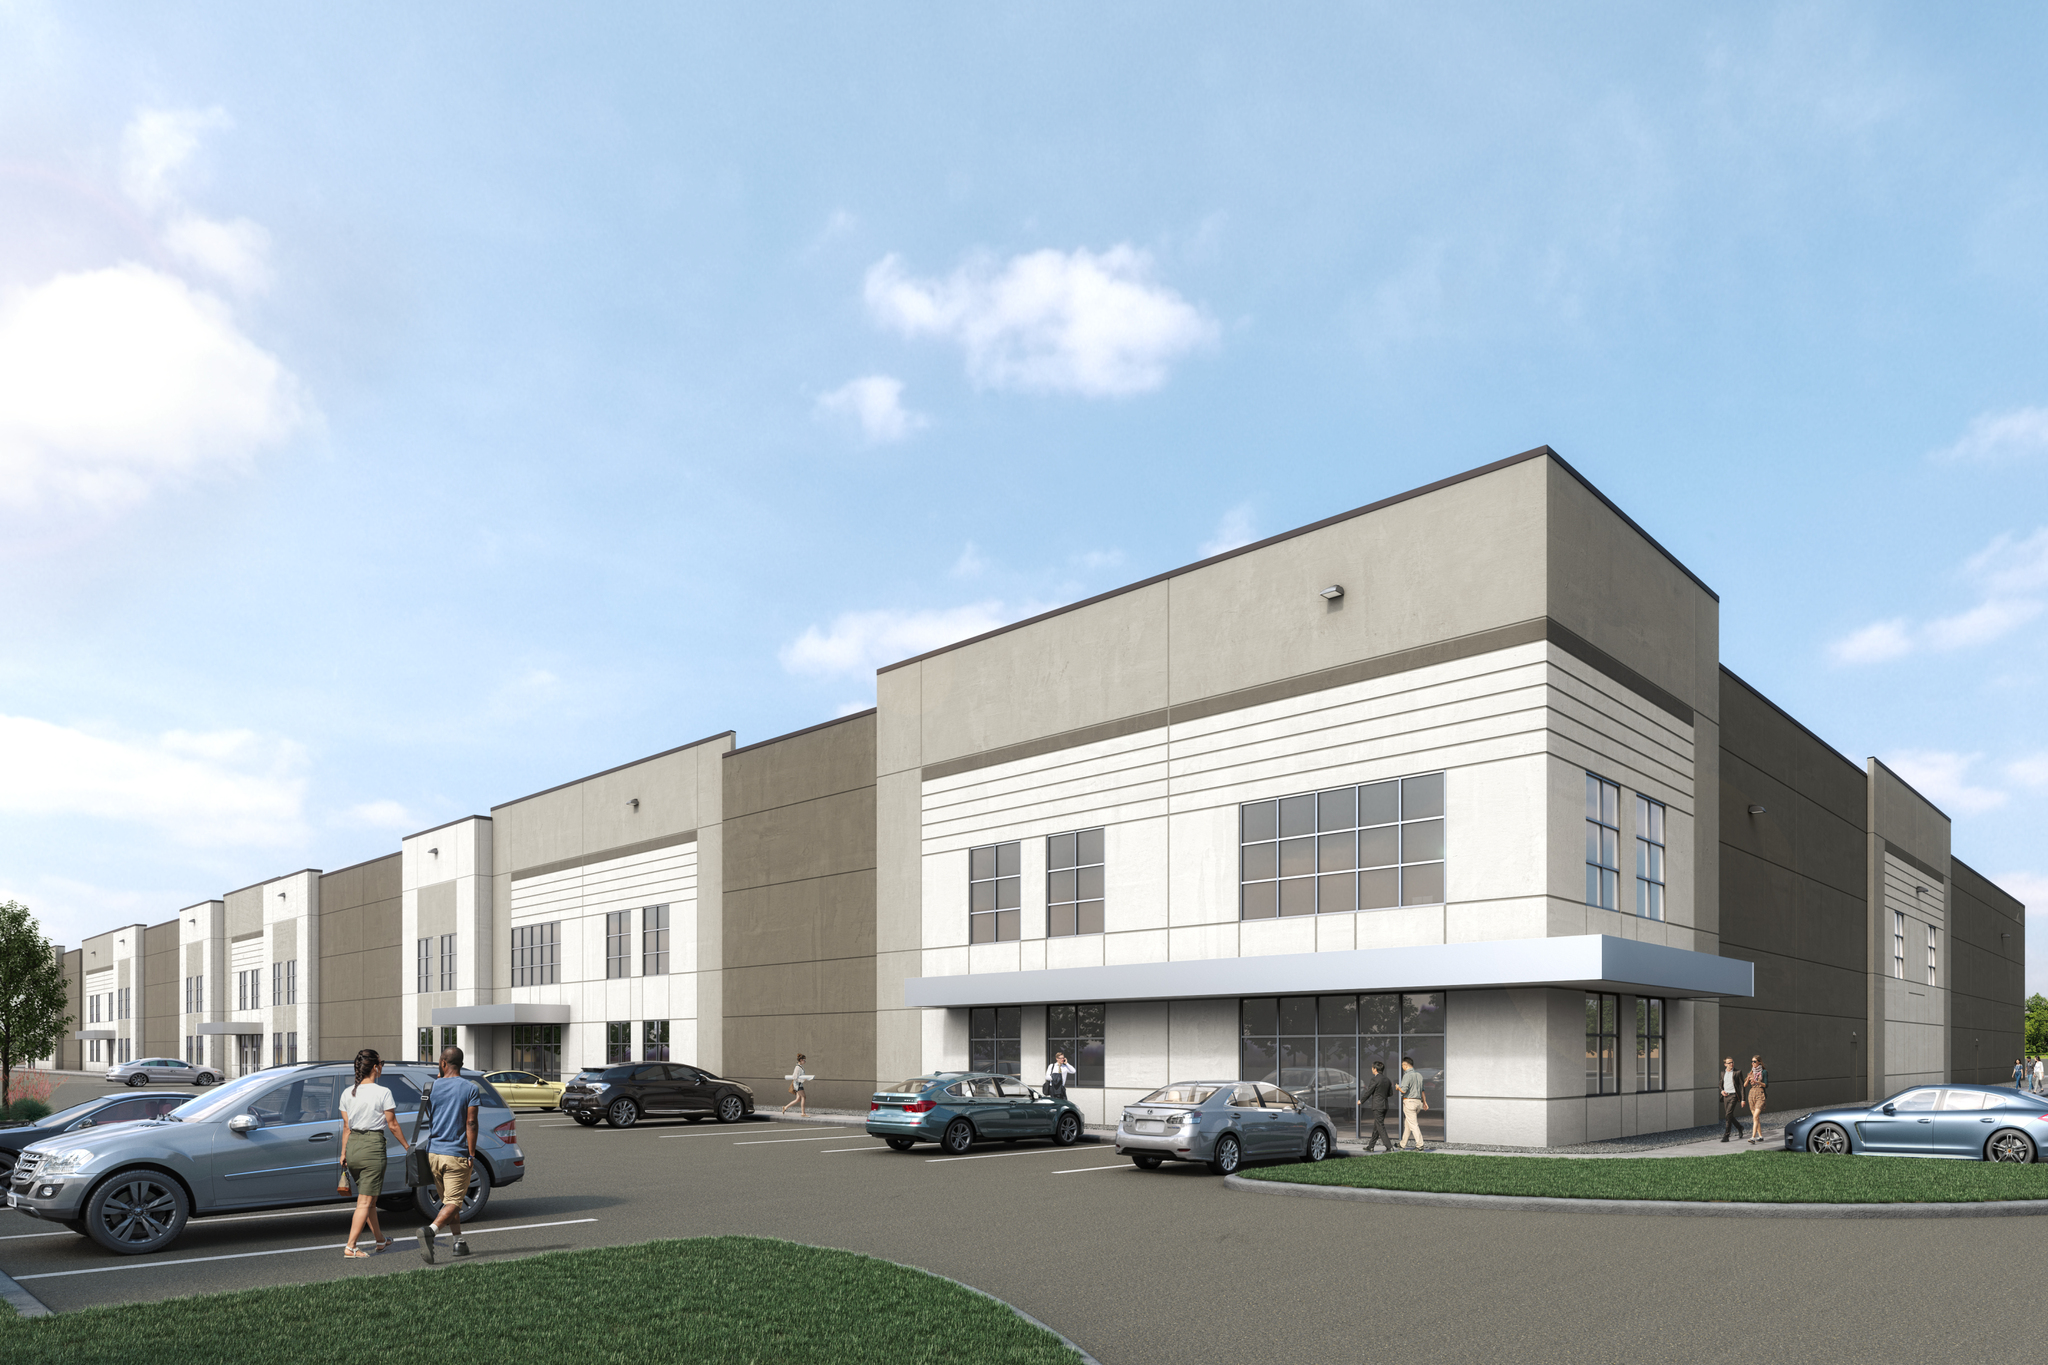 TexAmericas Center Breaks Ground on a New Spec Building